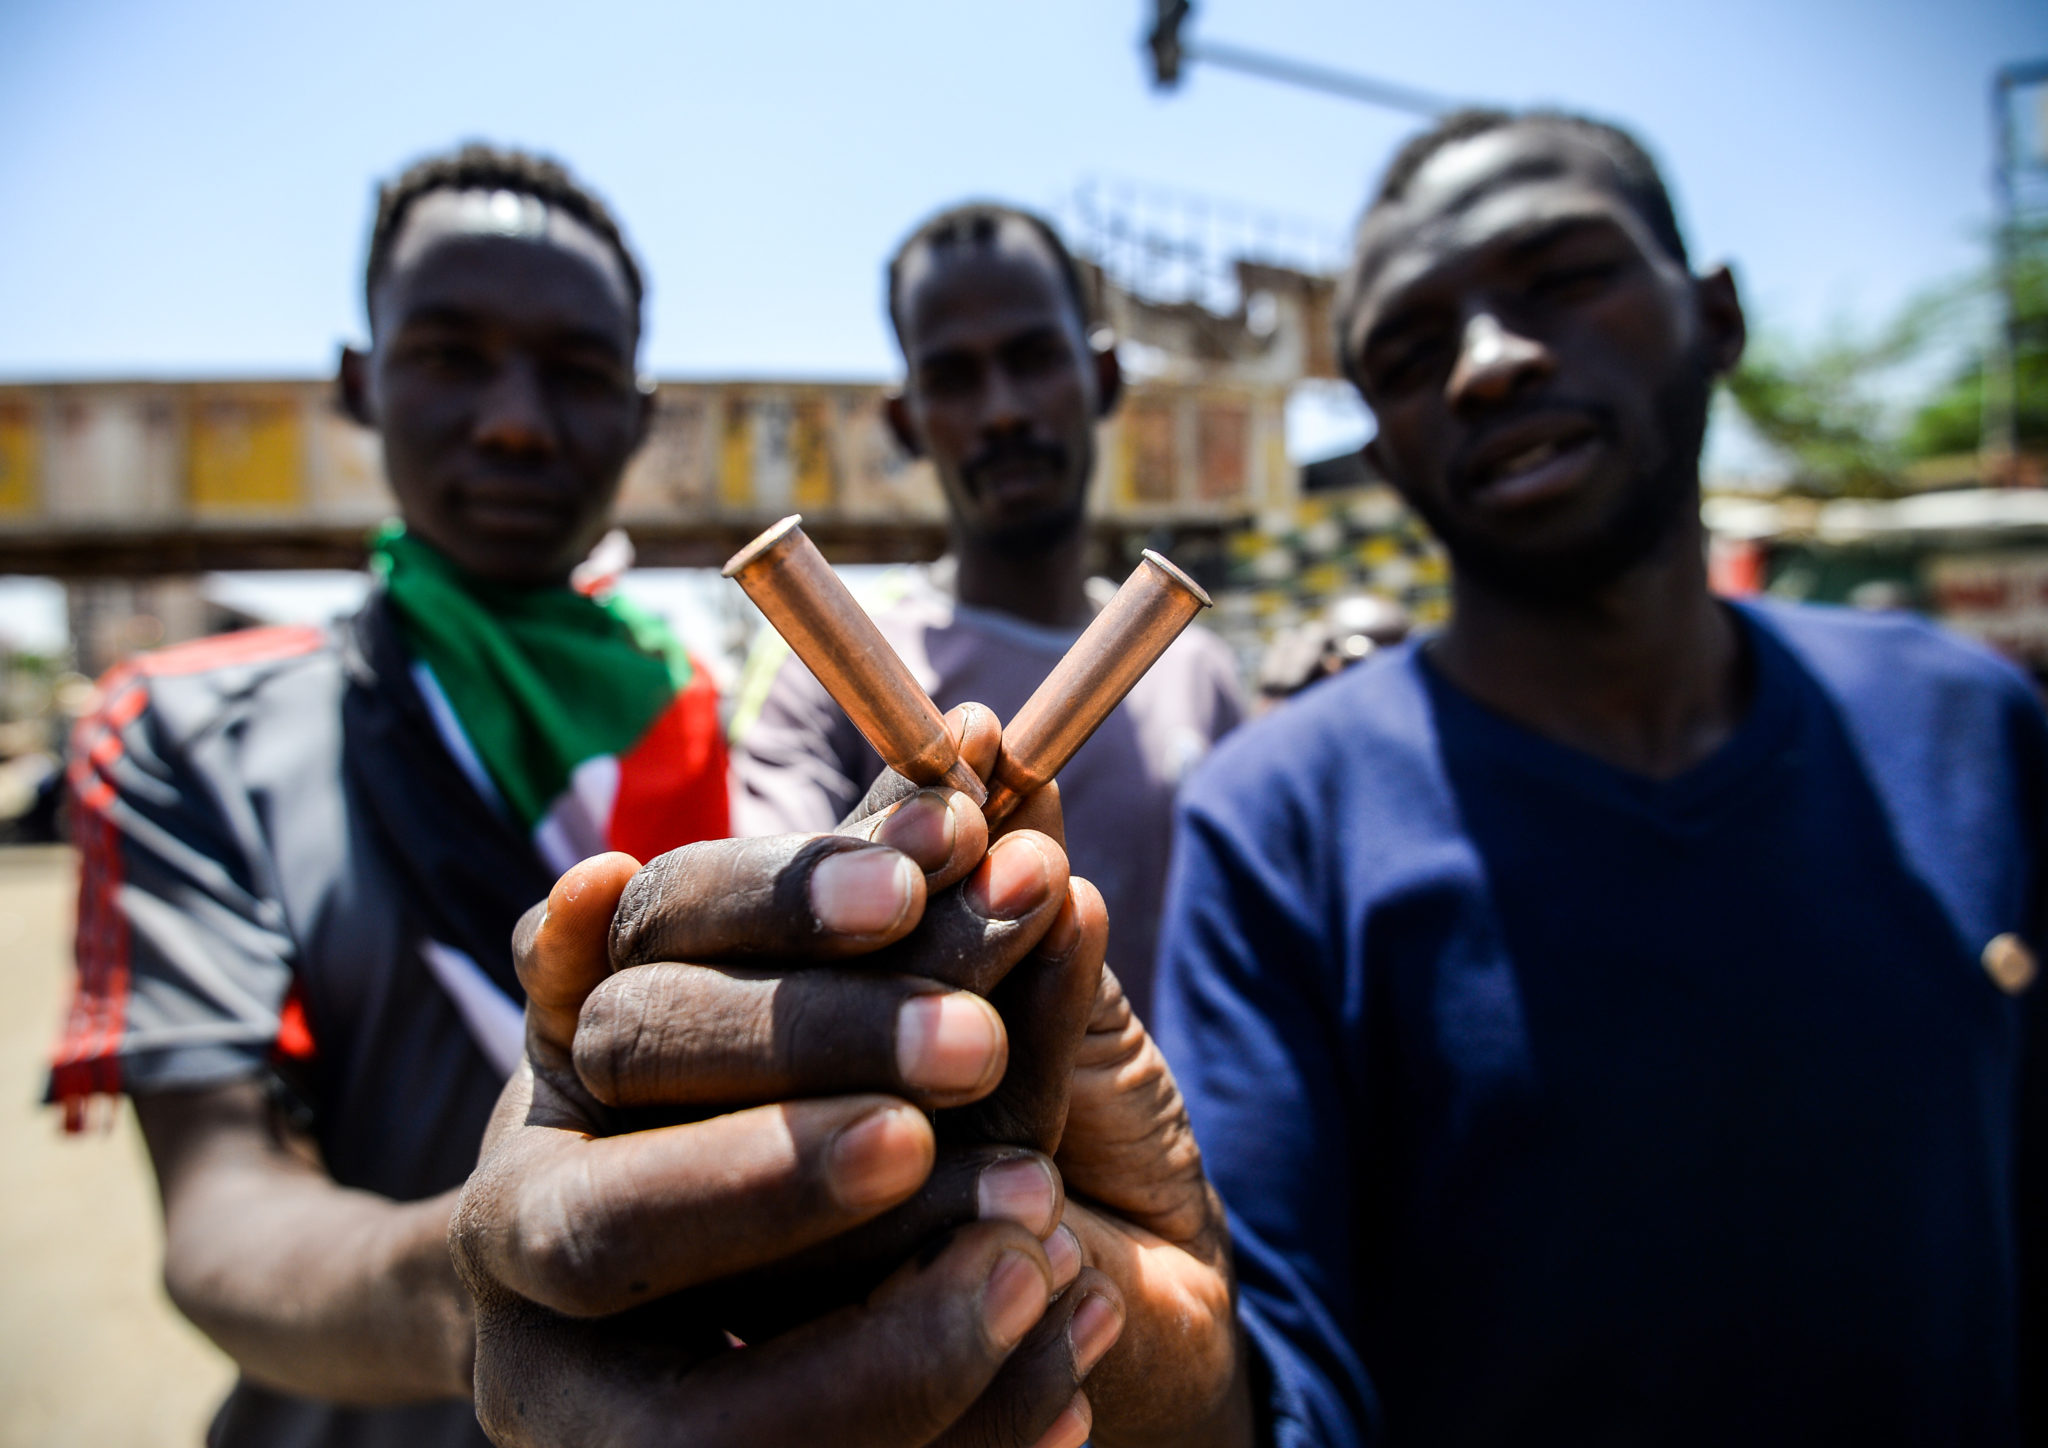 Sudan: Soaring violence calls for urgent international response